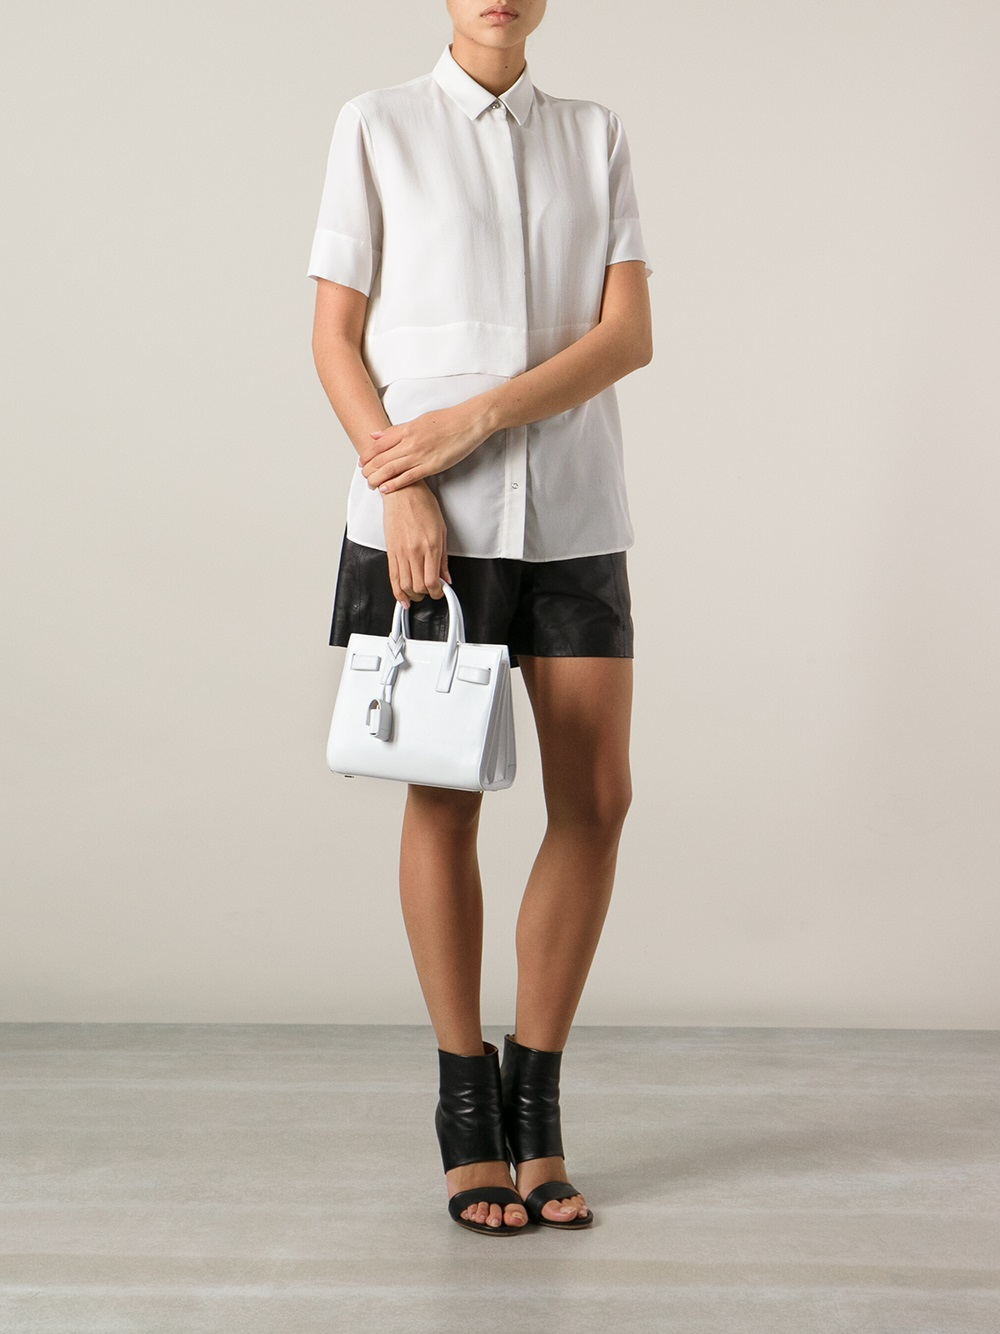 yves st laurent rive gauche shoes - classic baby sac de jour bag in black leather